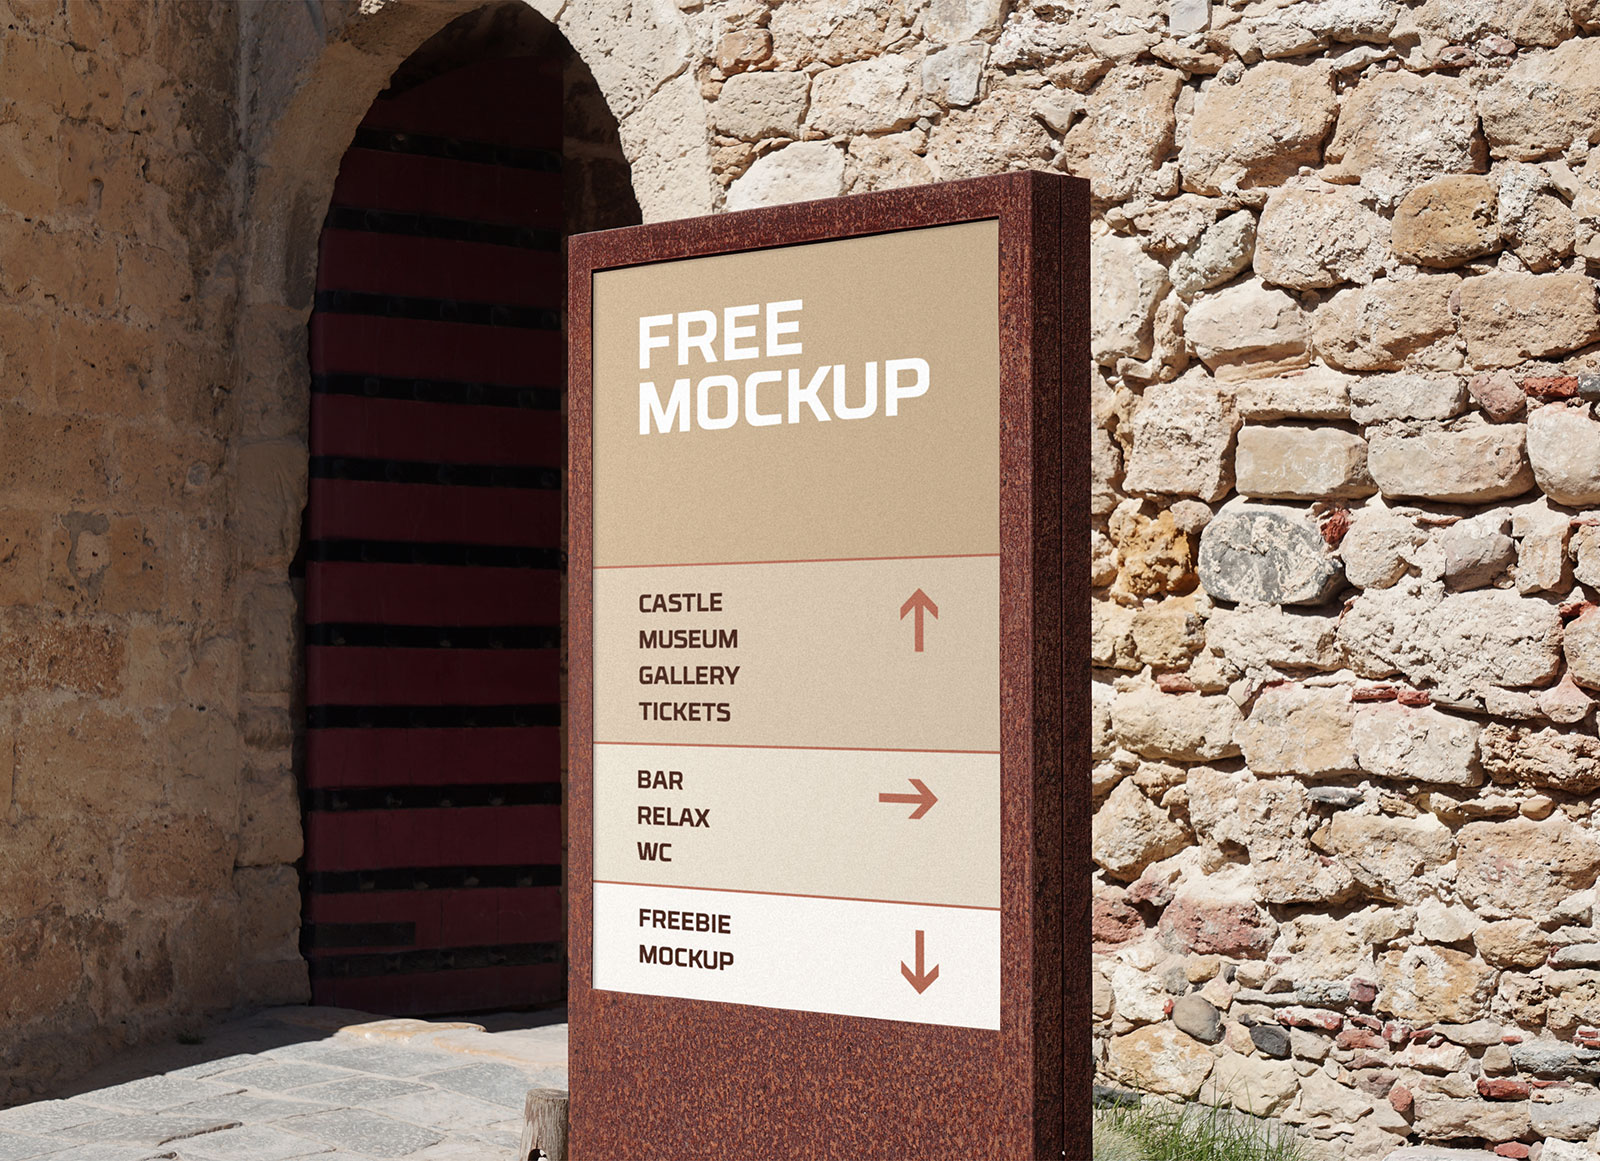 Free-Outdoor-Wayfinding-Mupi-Mockup-PSD